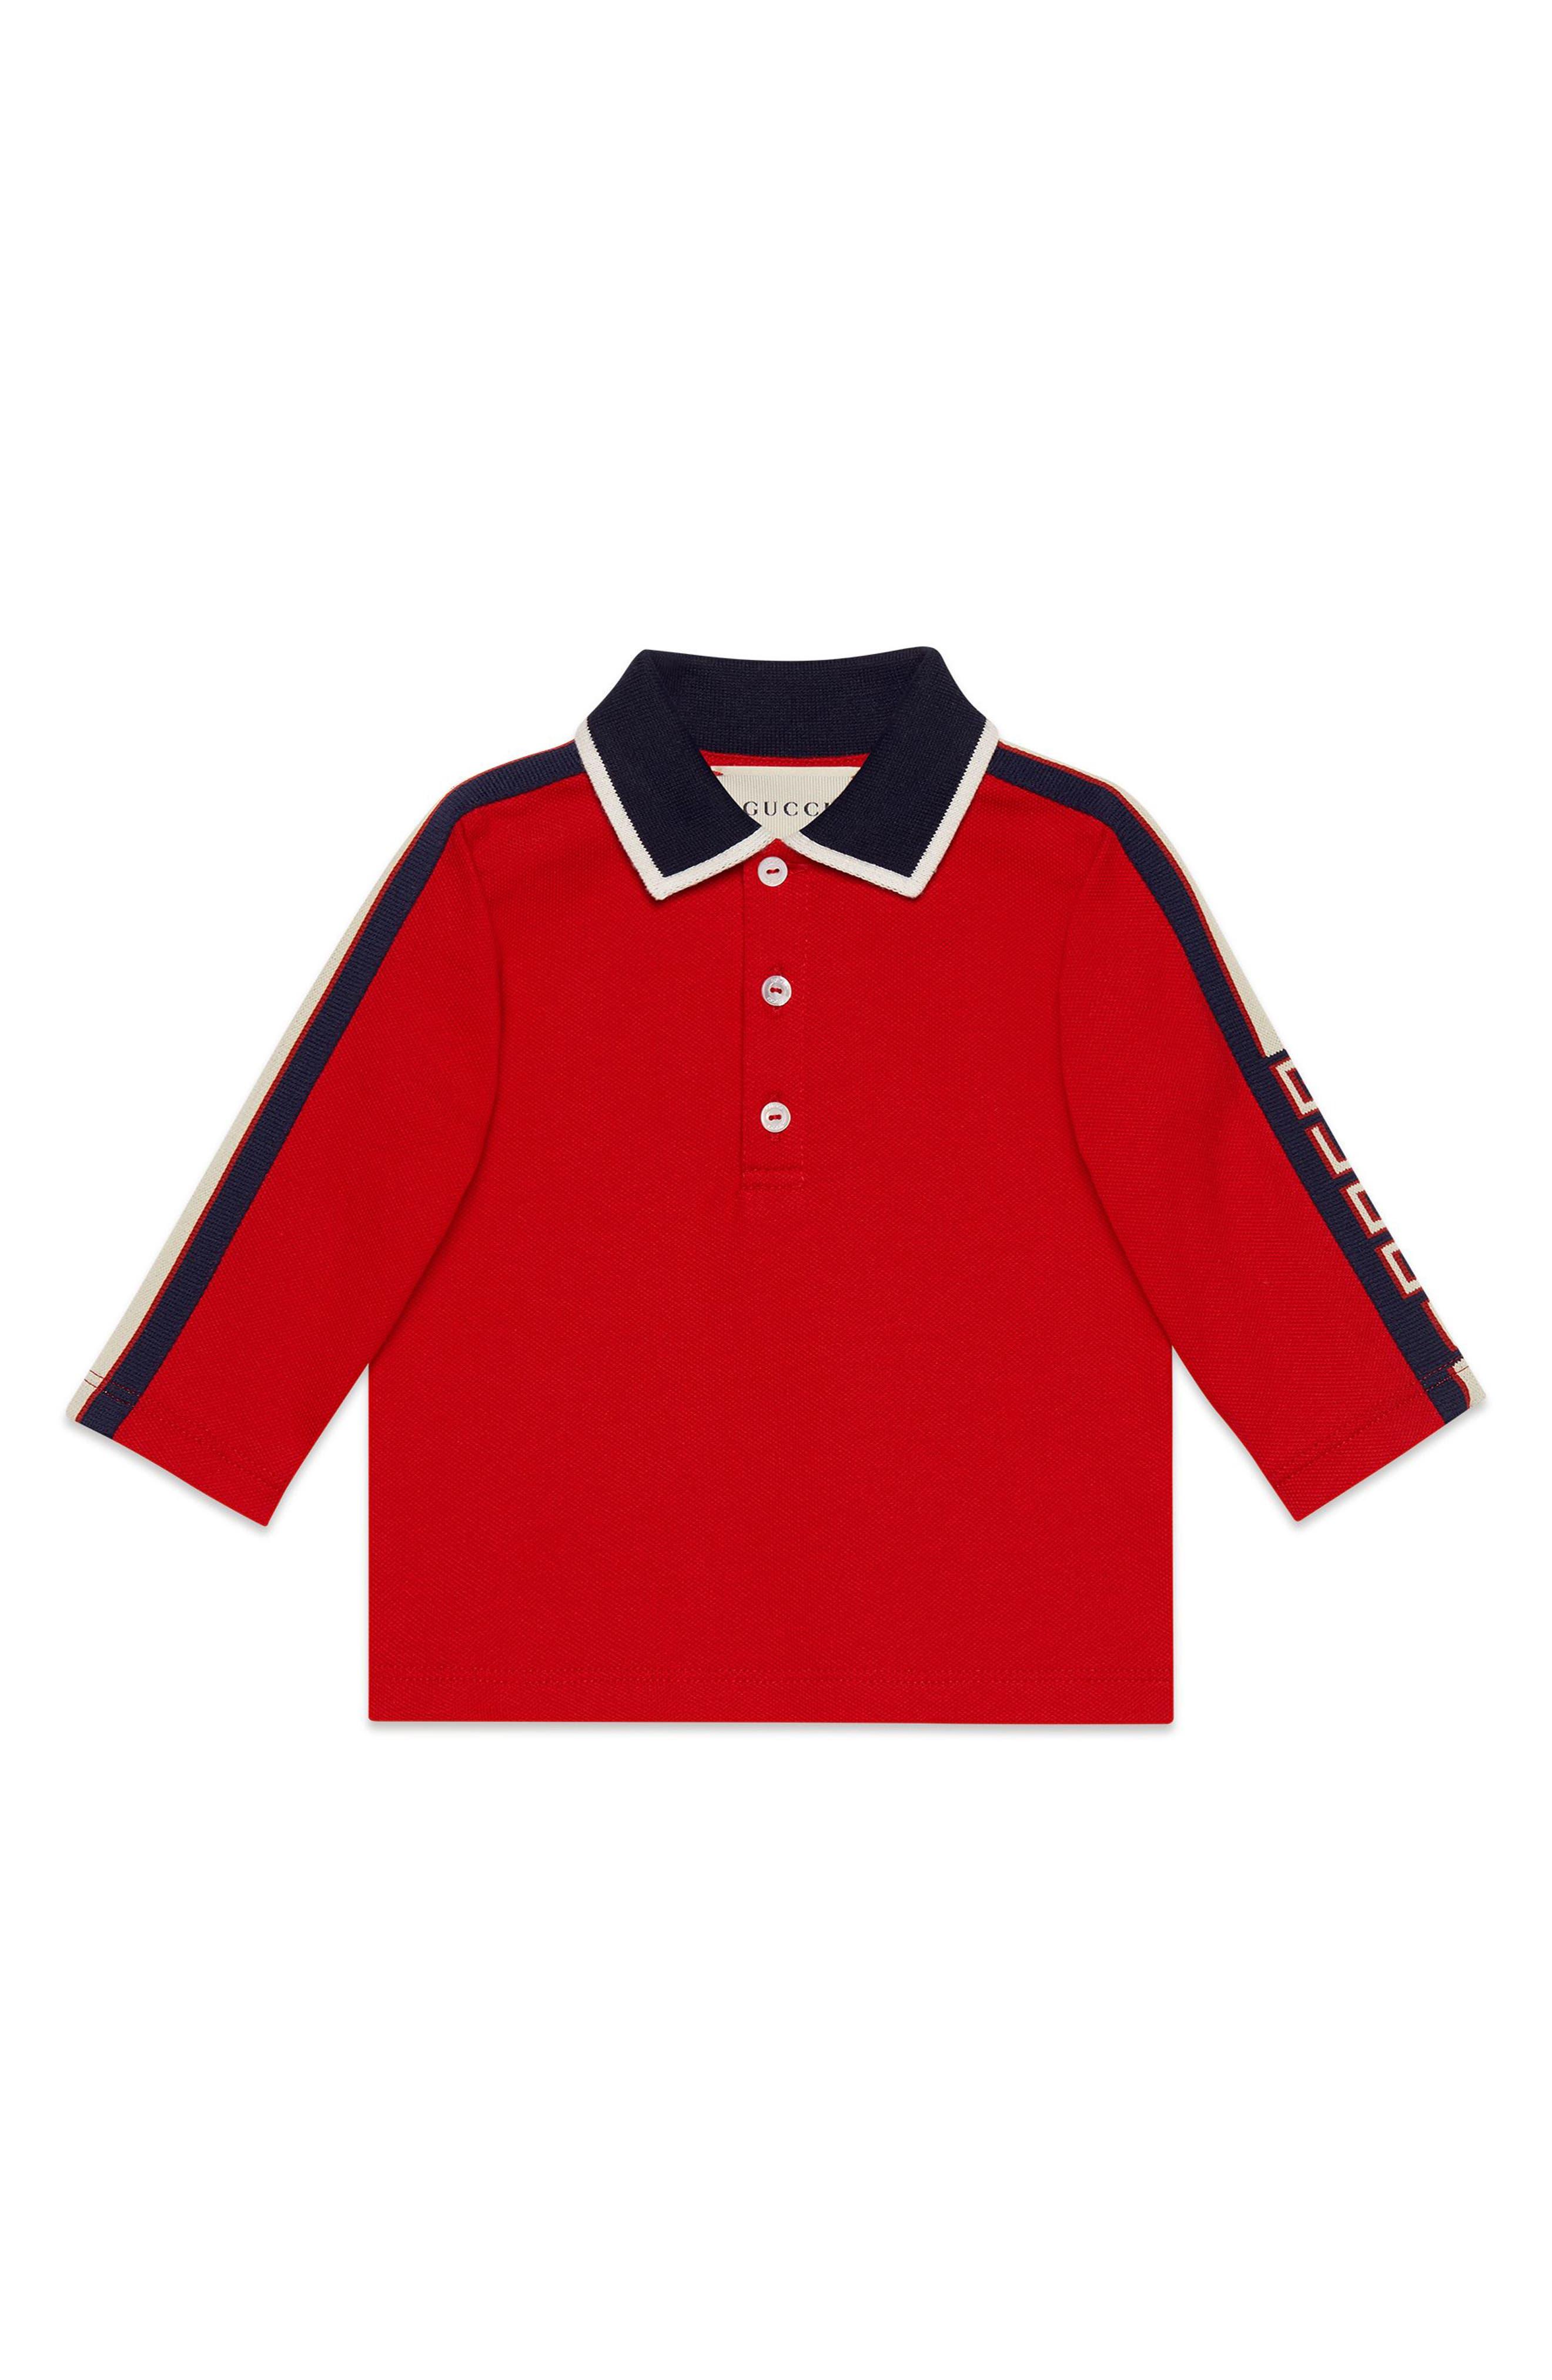 Infant Boys Gucci Long Sleeve Stripe Cotton Pique Polo Shirt Size 912M  Red